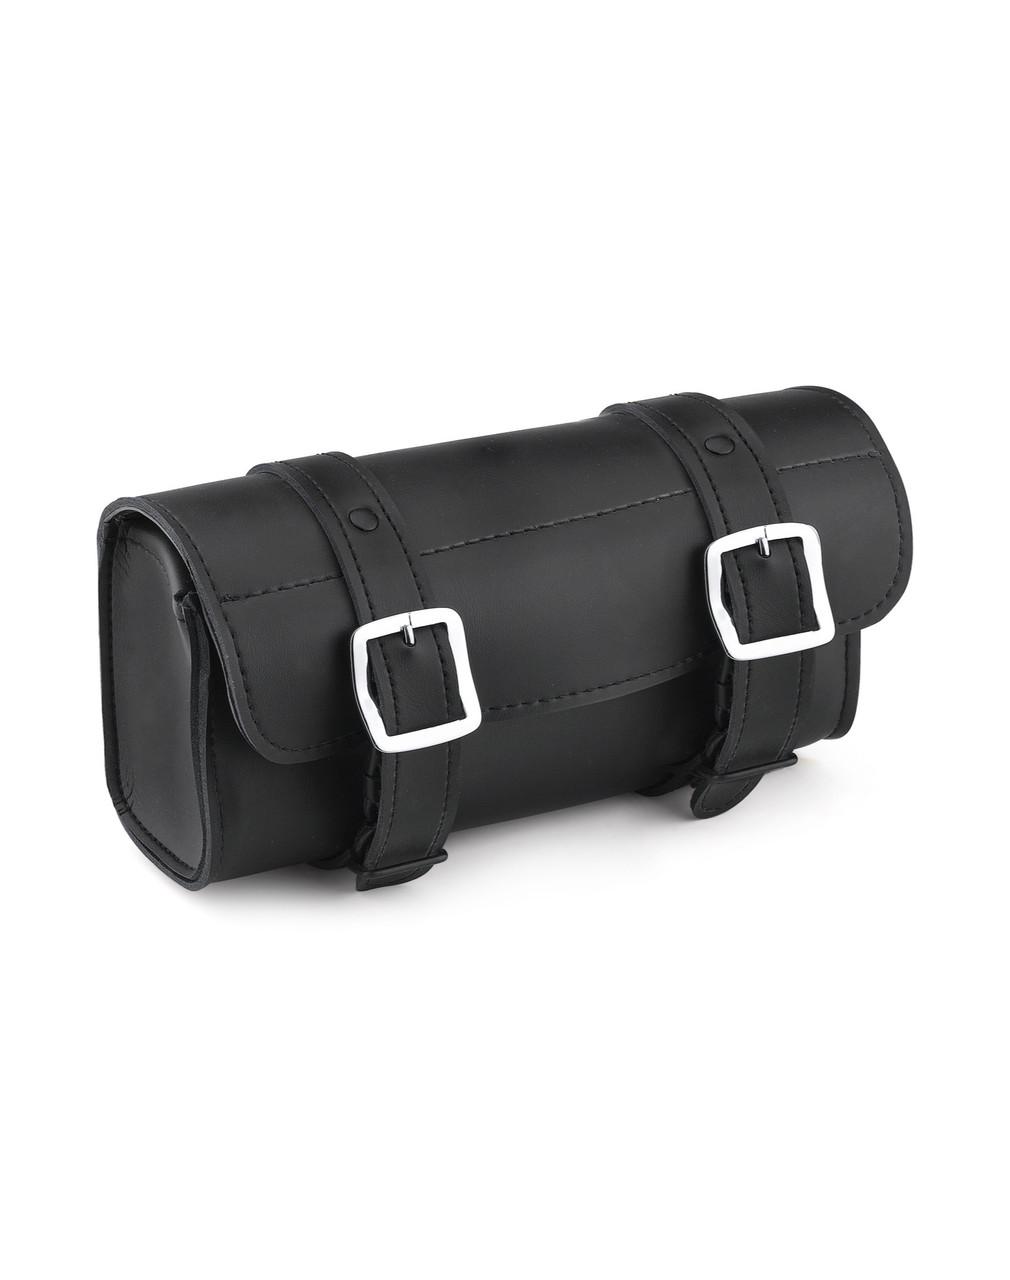 VikingBags Armor Plain Kawasaki Leather Motorcycle Handlebar Bag Main Bag View